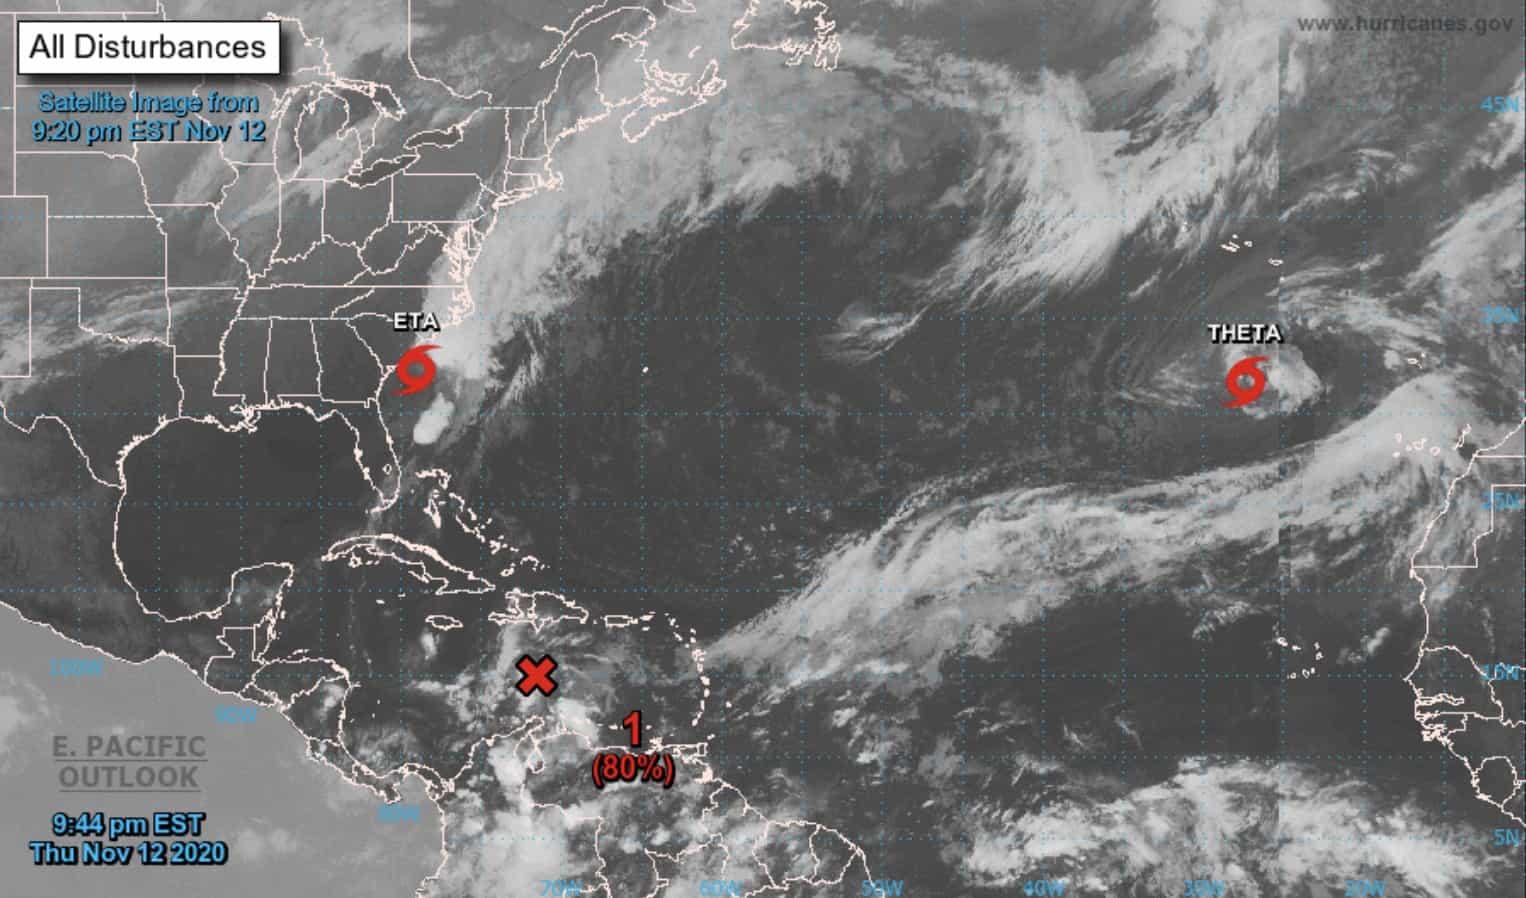 A tropical wave over the Caribbean Sea on November 12, 2020.